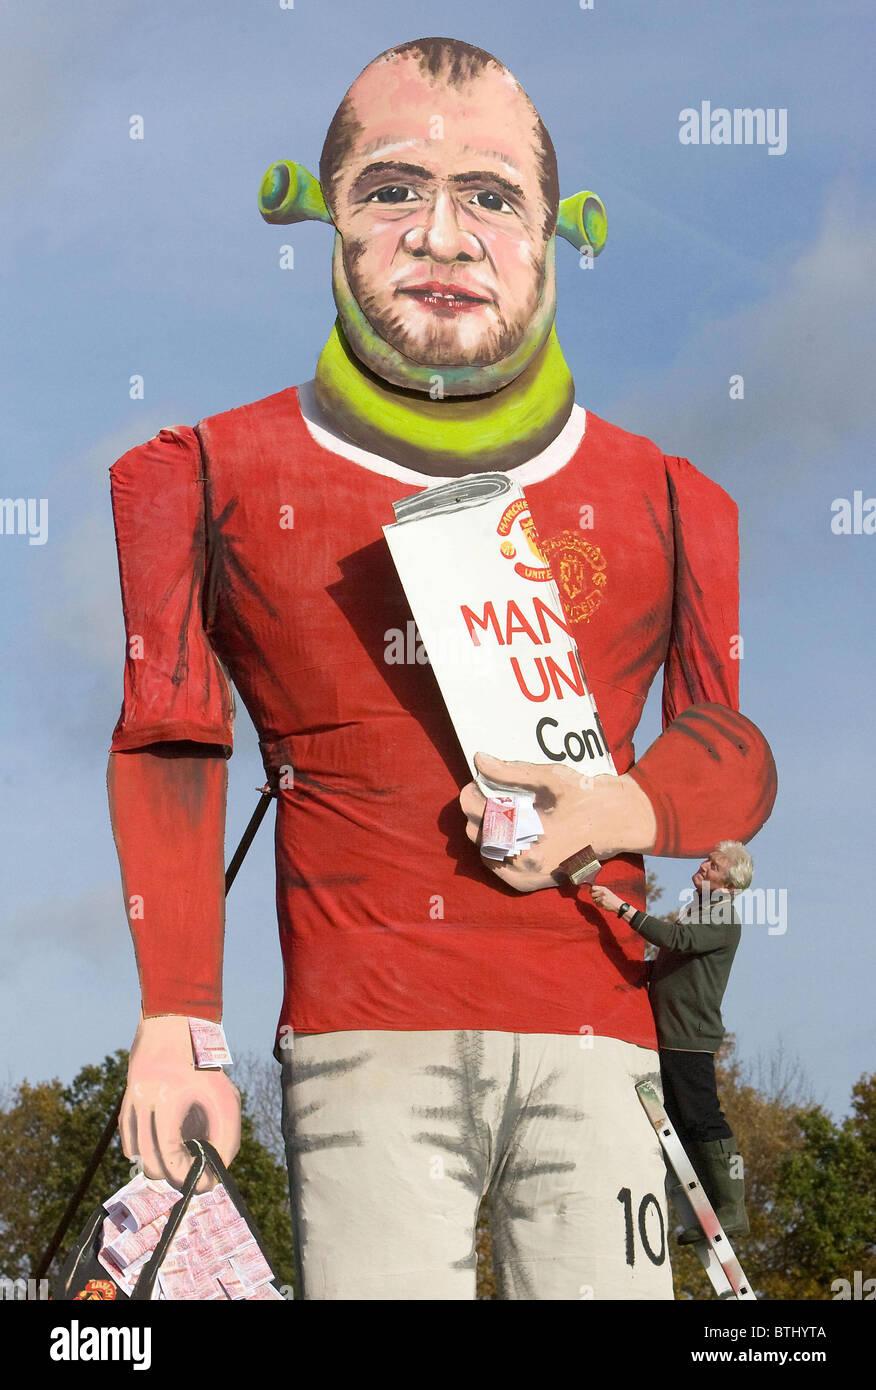 Edenbridge Bonfire societies giant effigy of Wayne Rooney. - Stock Image